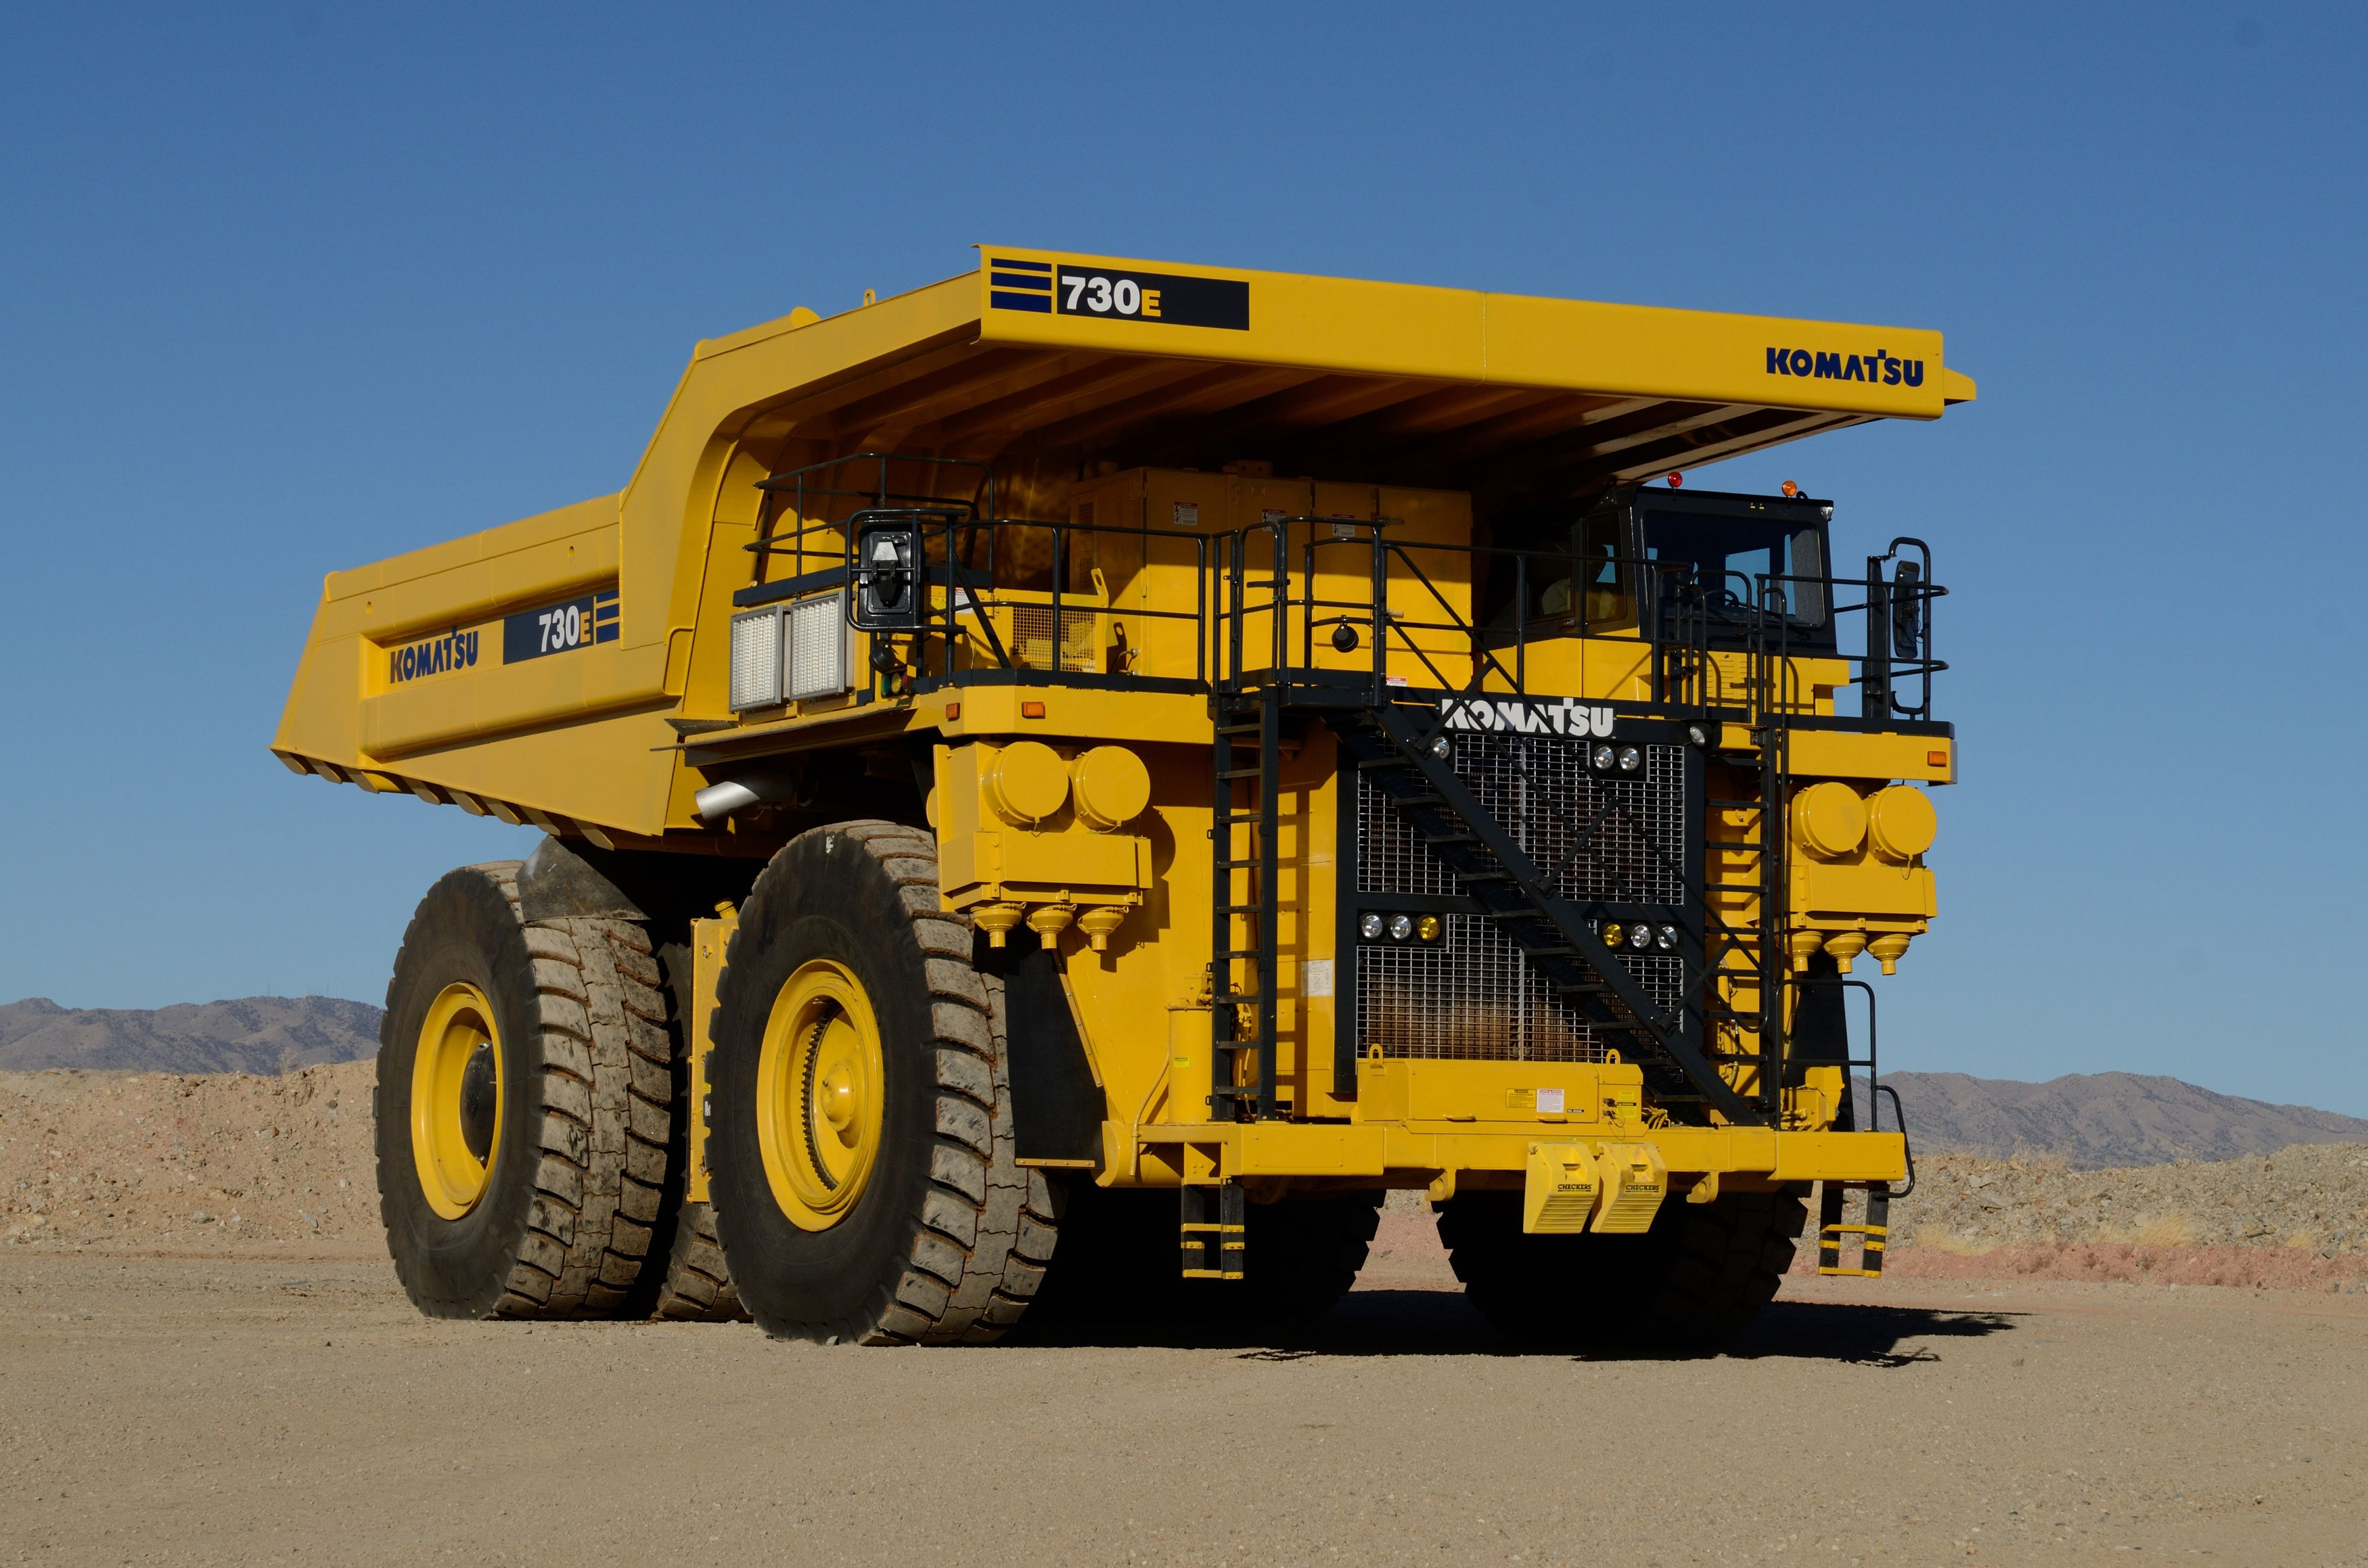 Komatsu updates 730E mining truck with AC electric drive | Equipment World  | Construction Equipment, News and Information | Heavy Construction  Equipment